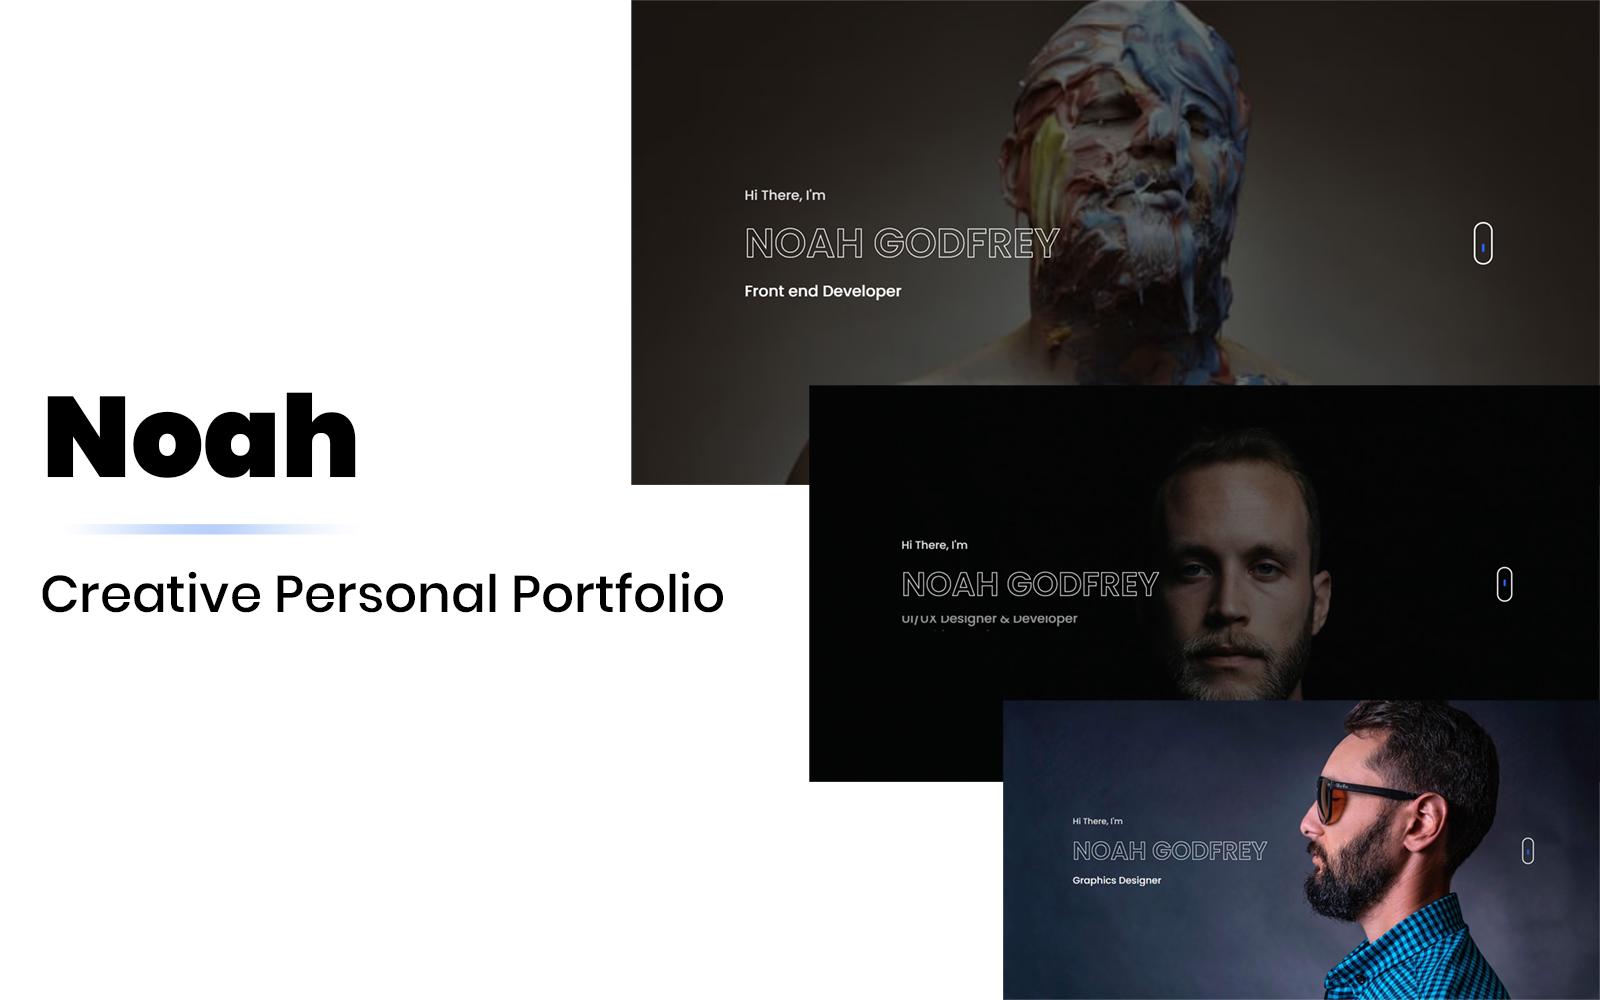 Noah - creative personal portfolio Landing Page Template